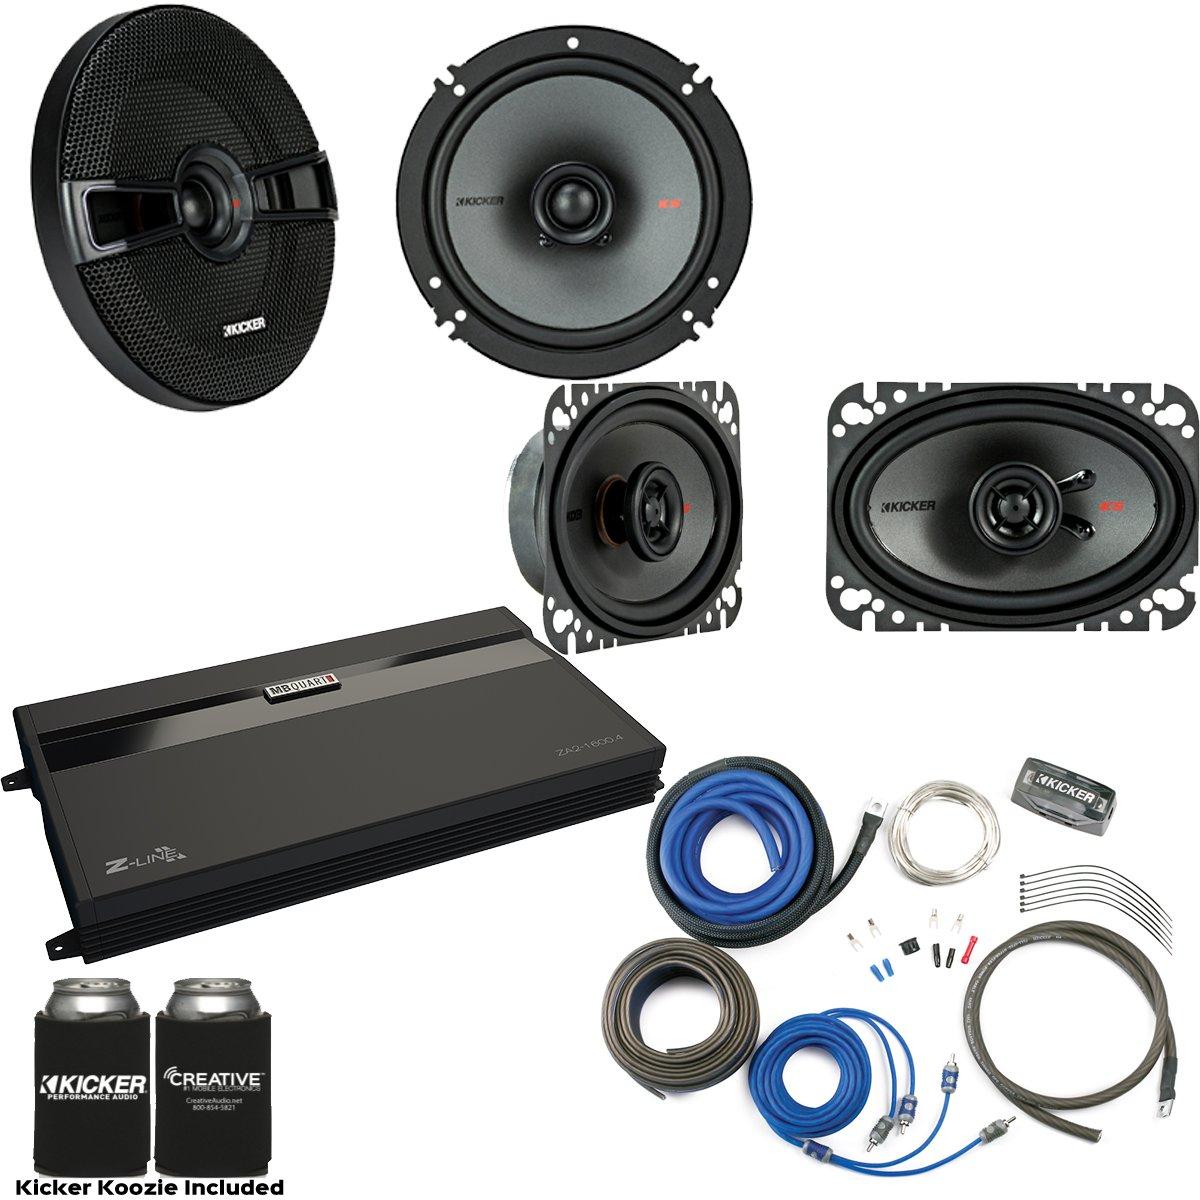 Kicker 44KSC6504 6.5'' Coaxial Speakers, 44KSC4604 4x6'' Speakers. MB Quart ZA2-1600.4 4-Channel Amp & Wire Kit